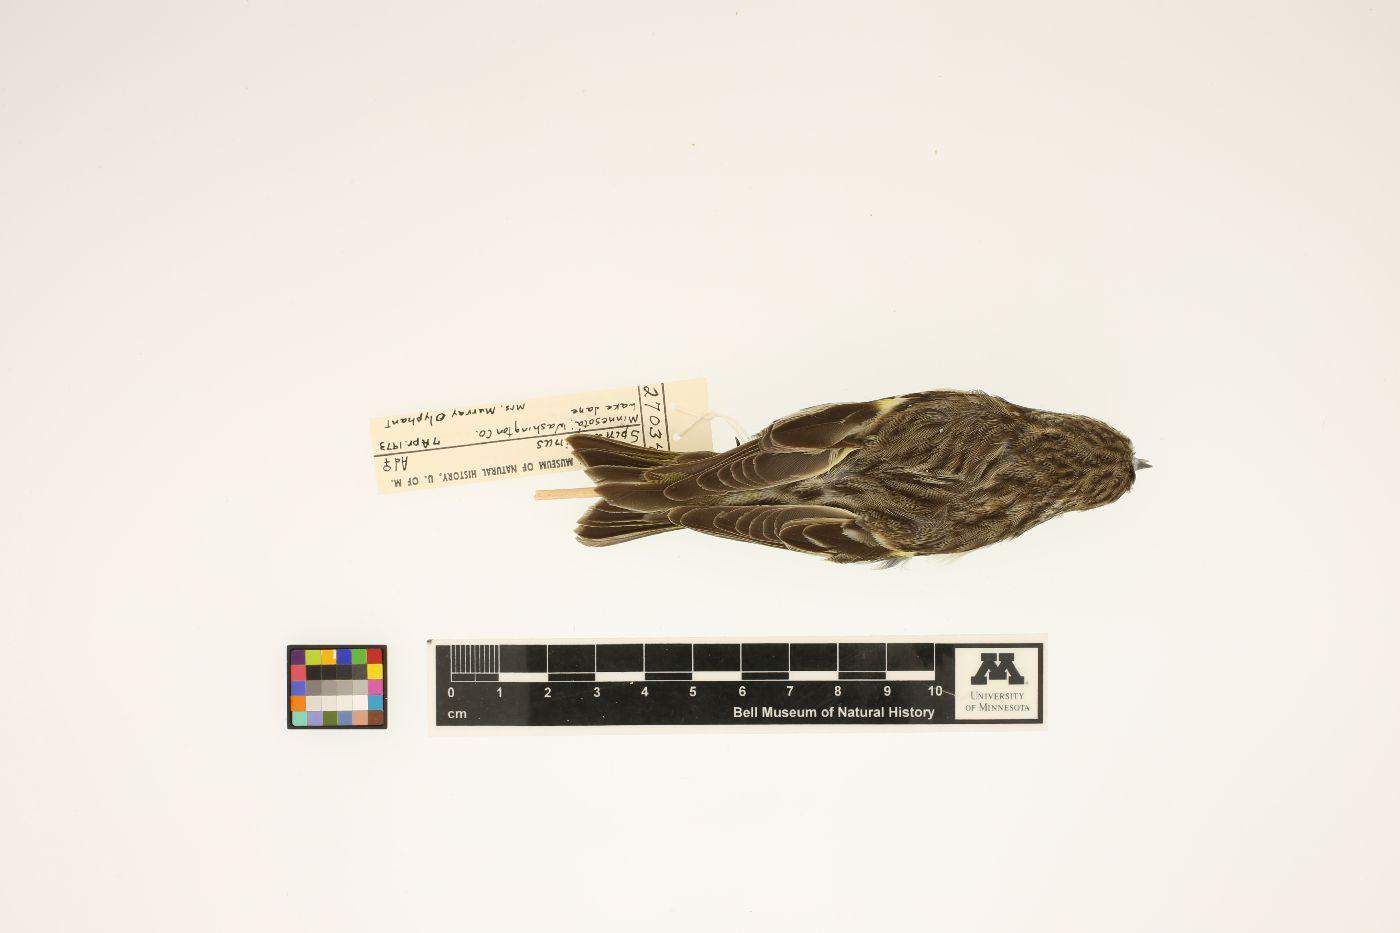 Carduelis pinus image